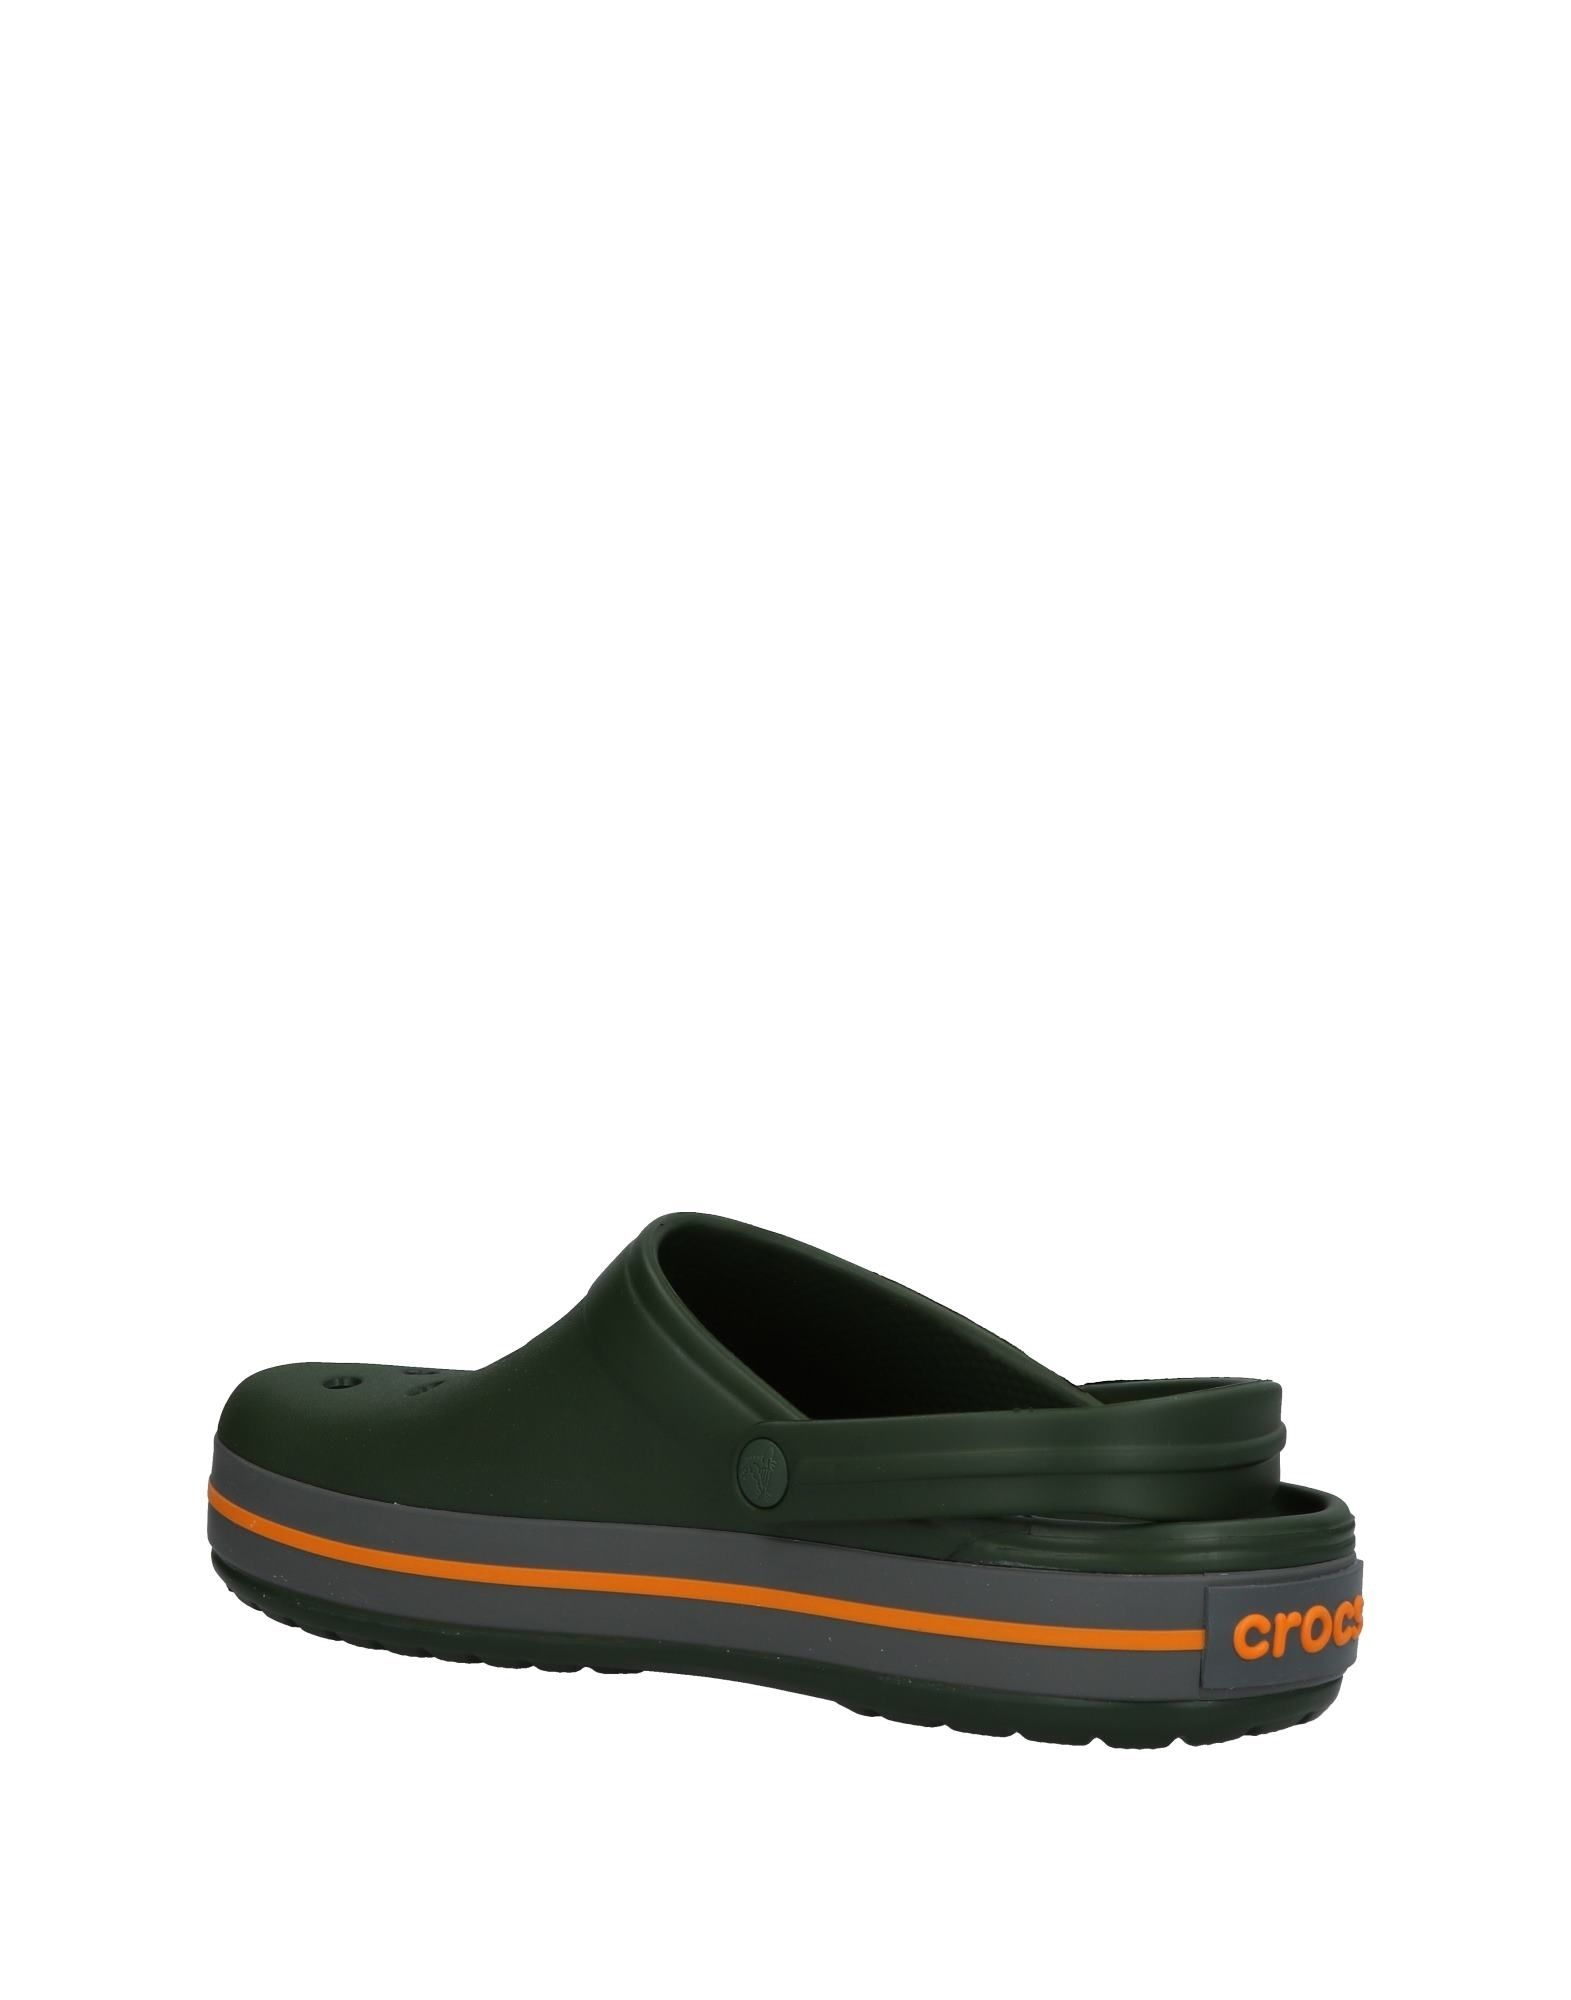 Crocs Sandalen Herren  11441735WP 11441735WP  61fe41